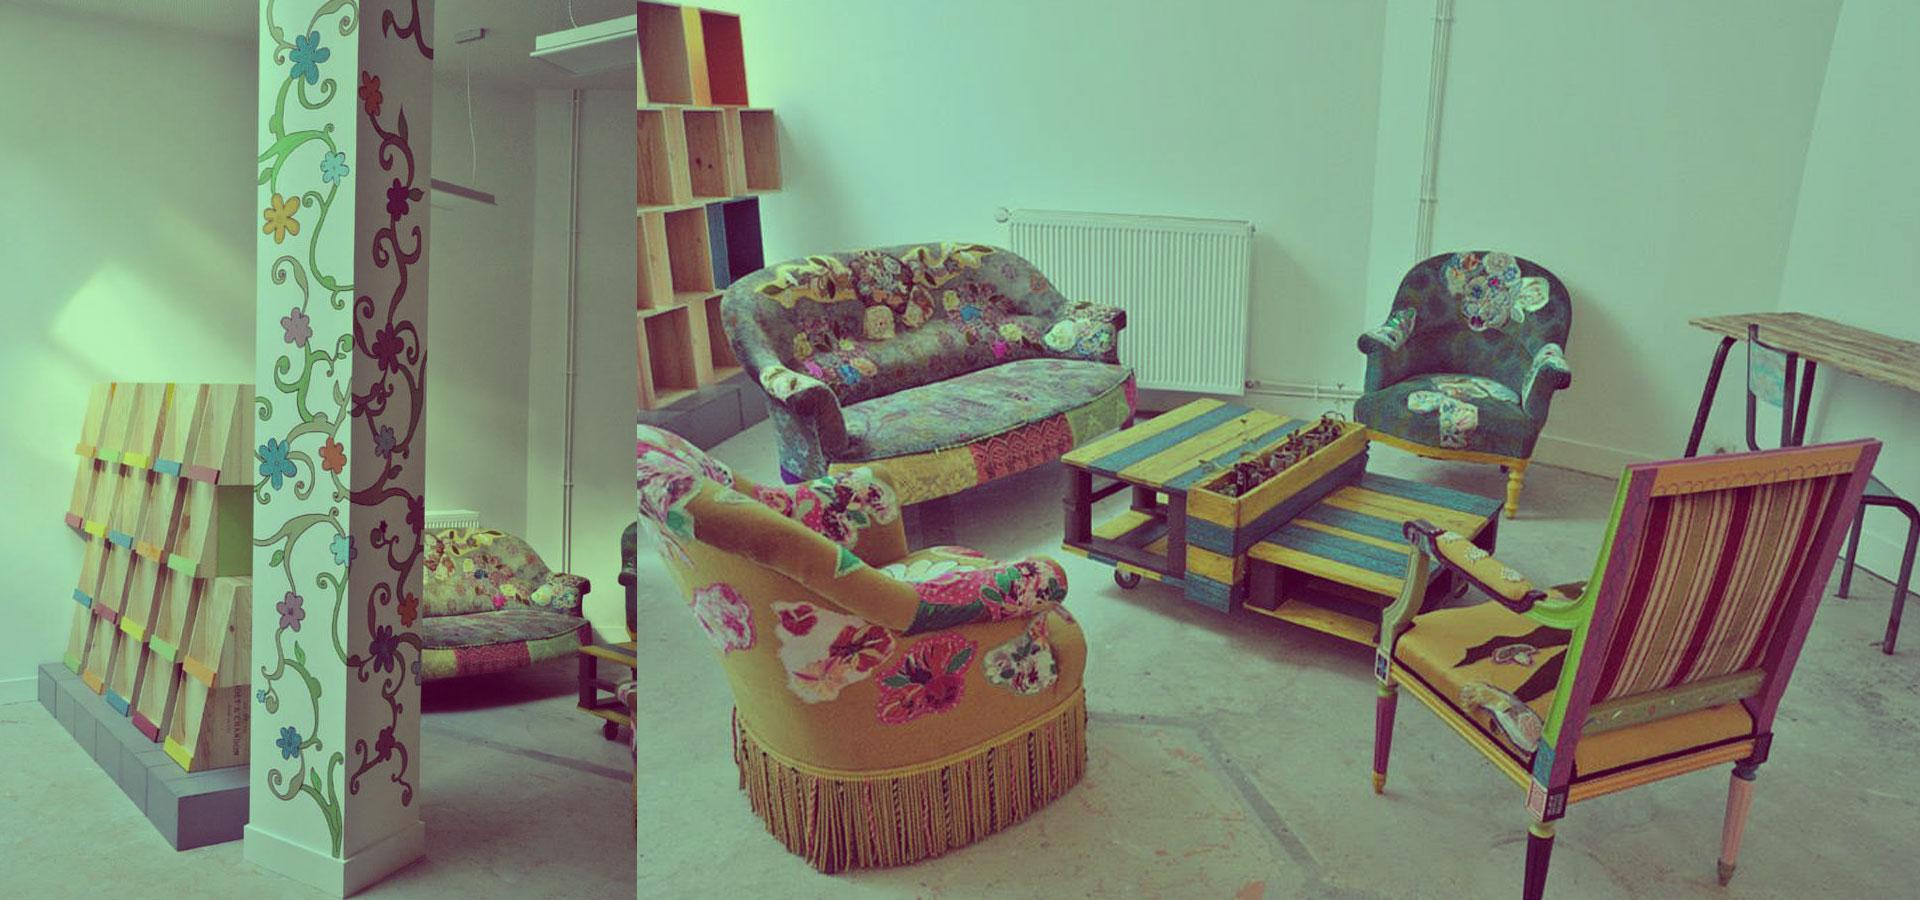 atelier po 093 atelier d co solidaire. Black Bedroom Furniture Sets. Home Design Ideas